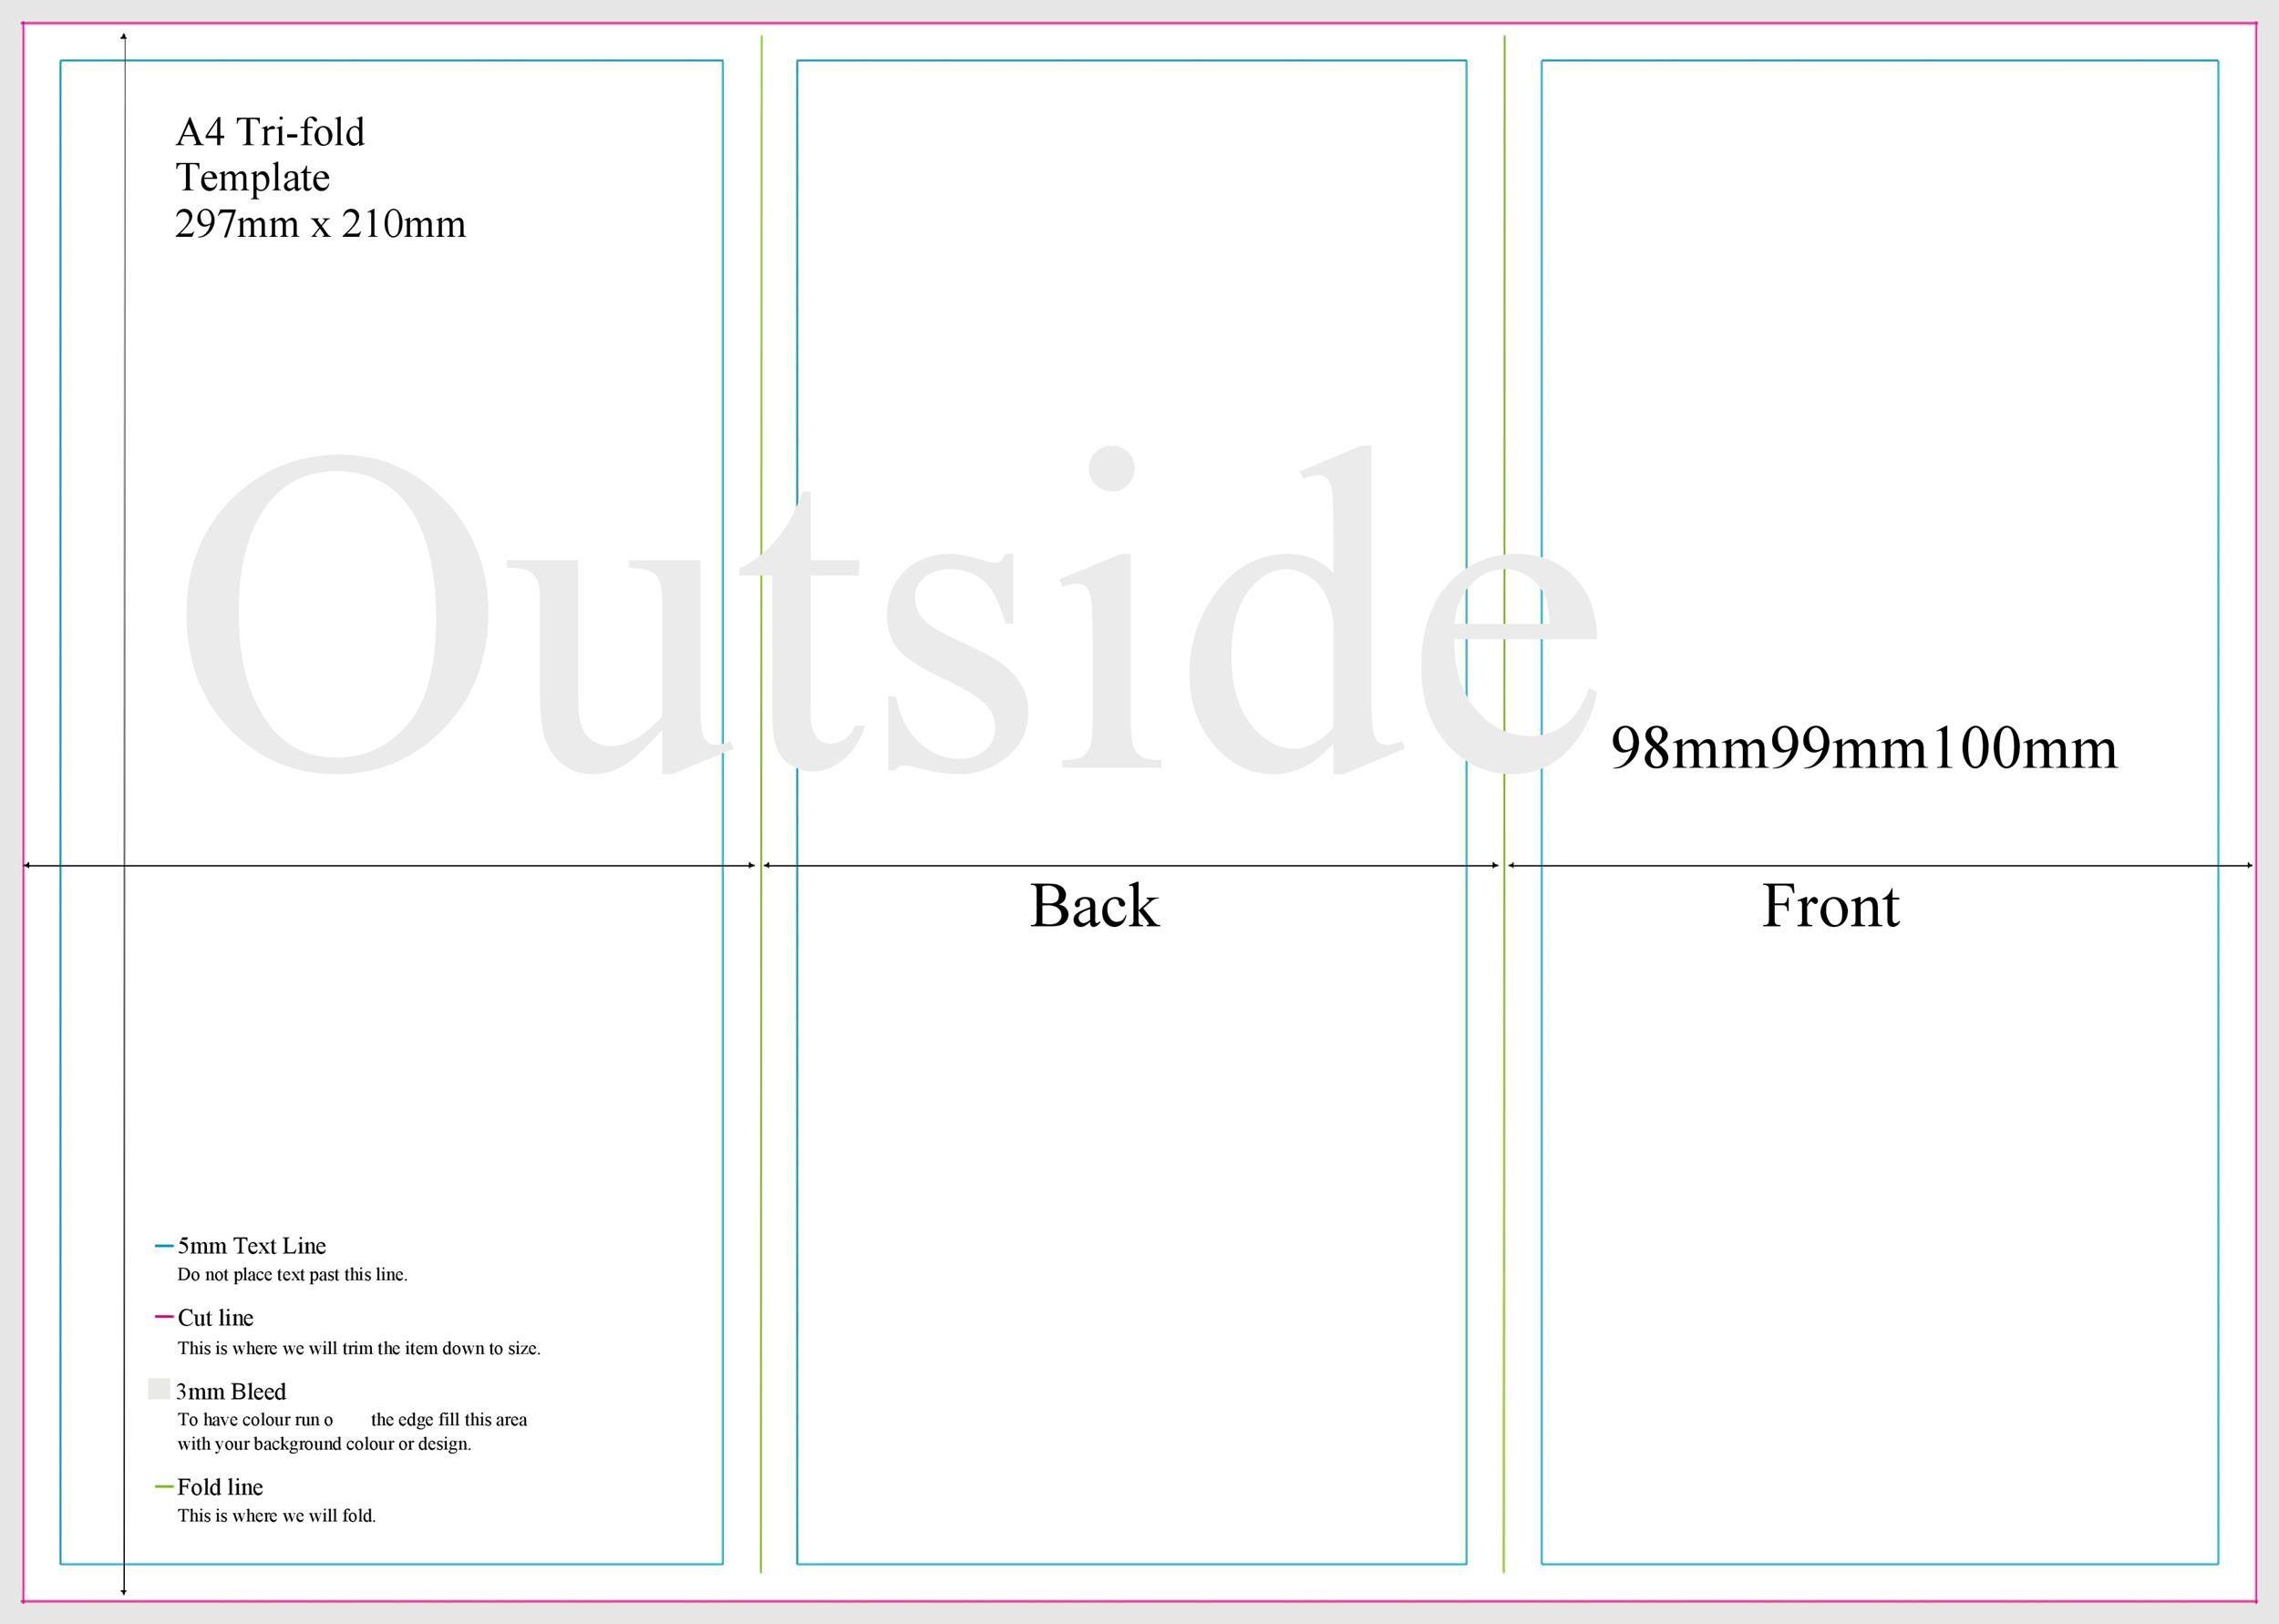 009 Fantastic Brochure Template Google Doc Image  Blank Tri Fold SlideFull